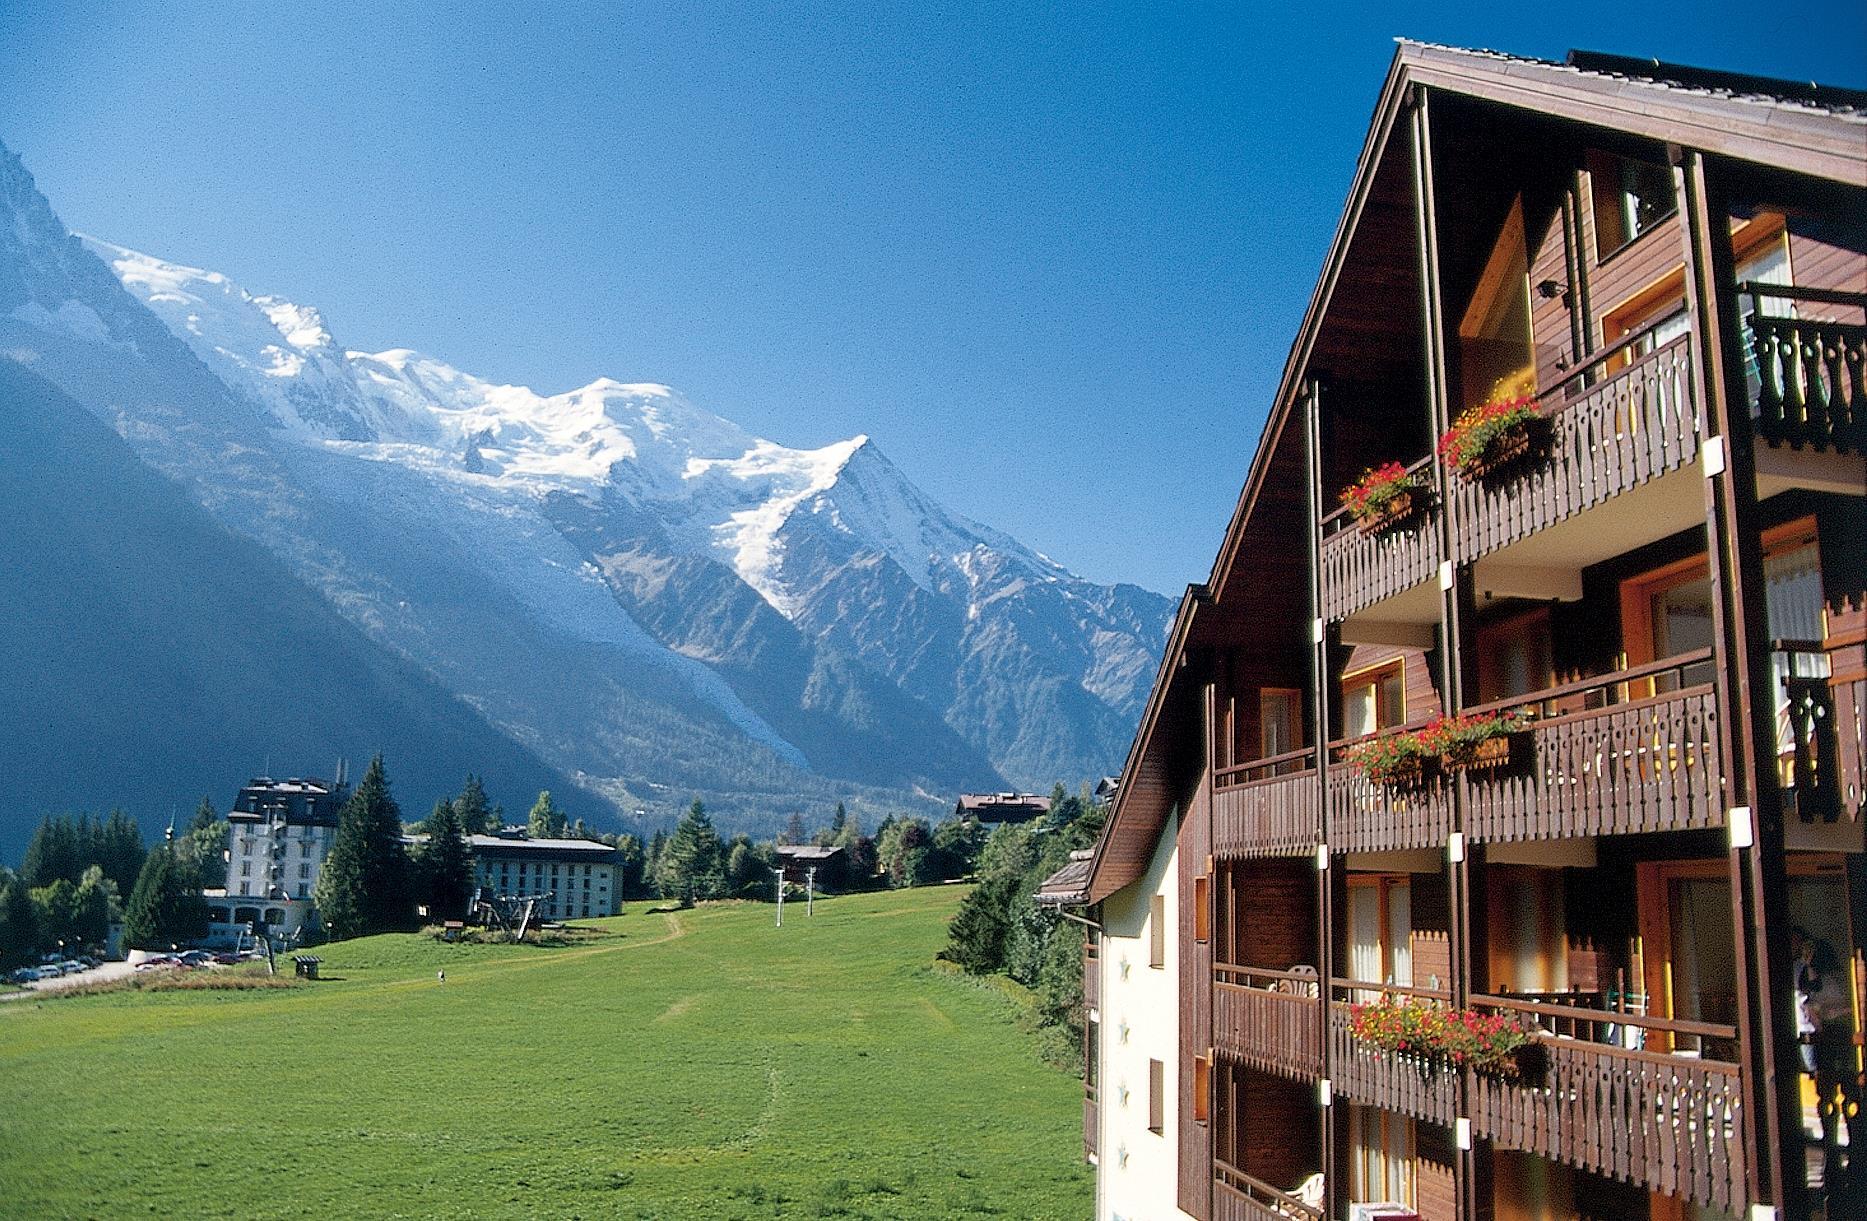 Chamonix mont blanc summer holidays france peak retreats for Hotels chamonix